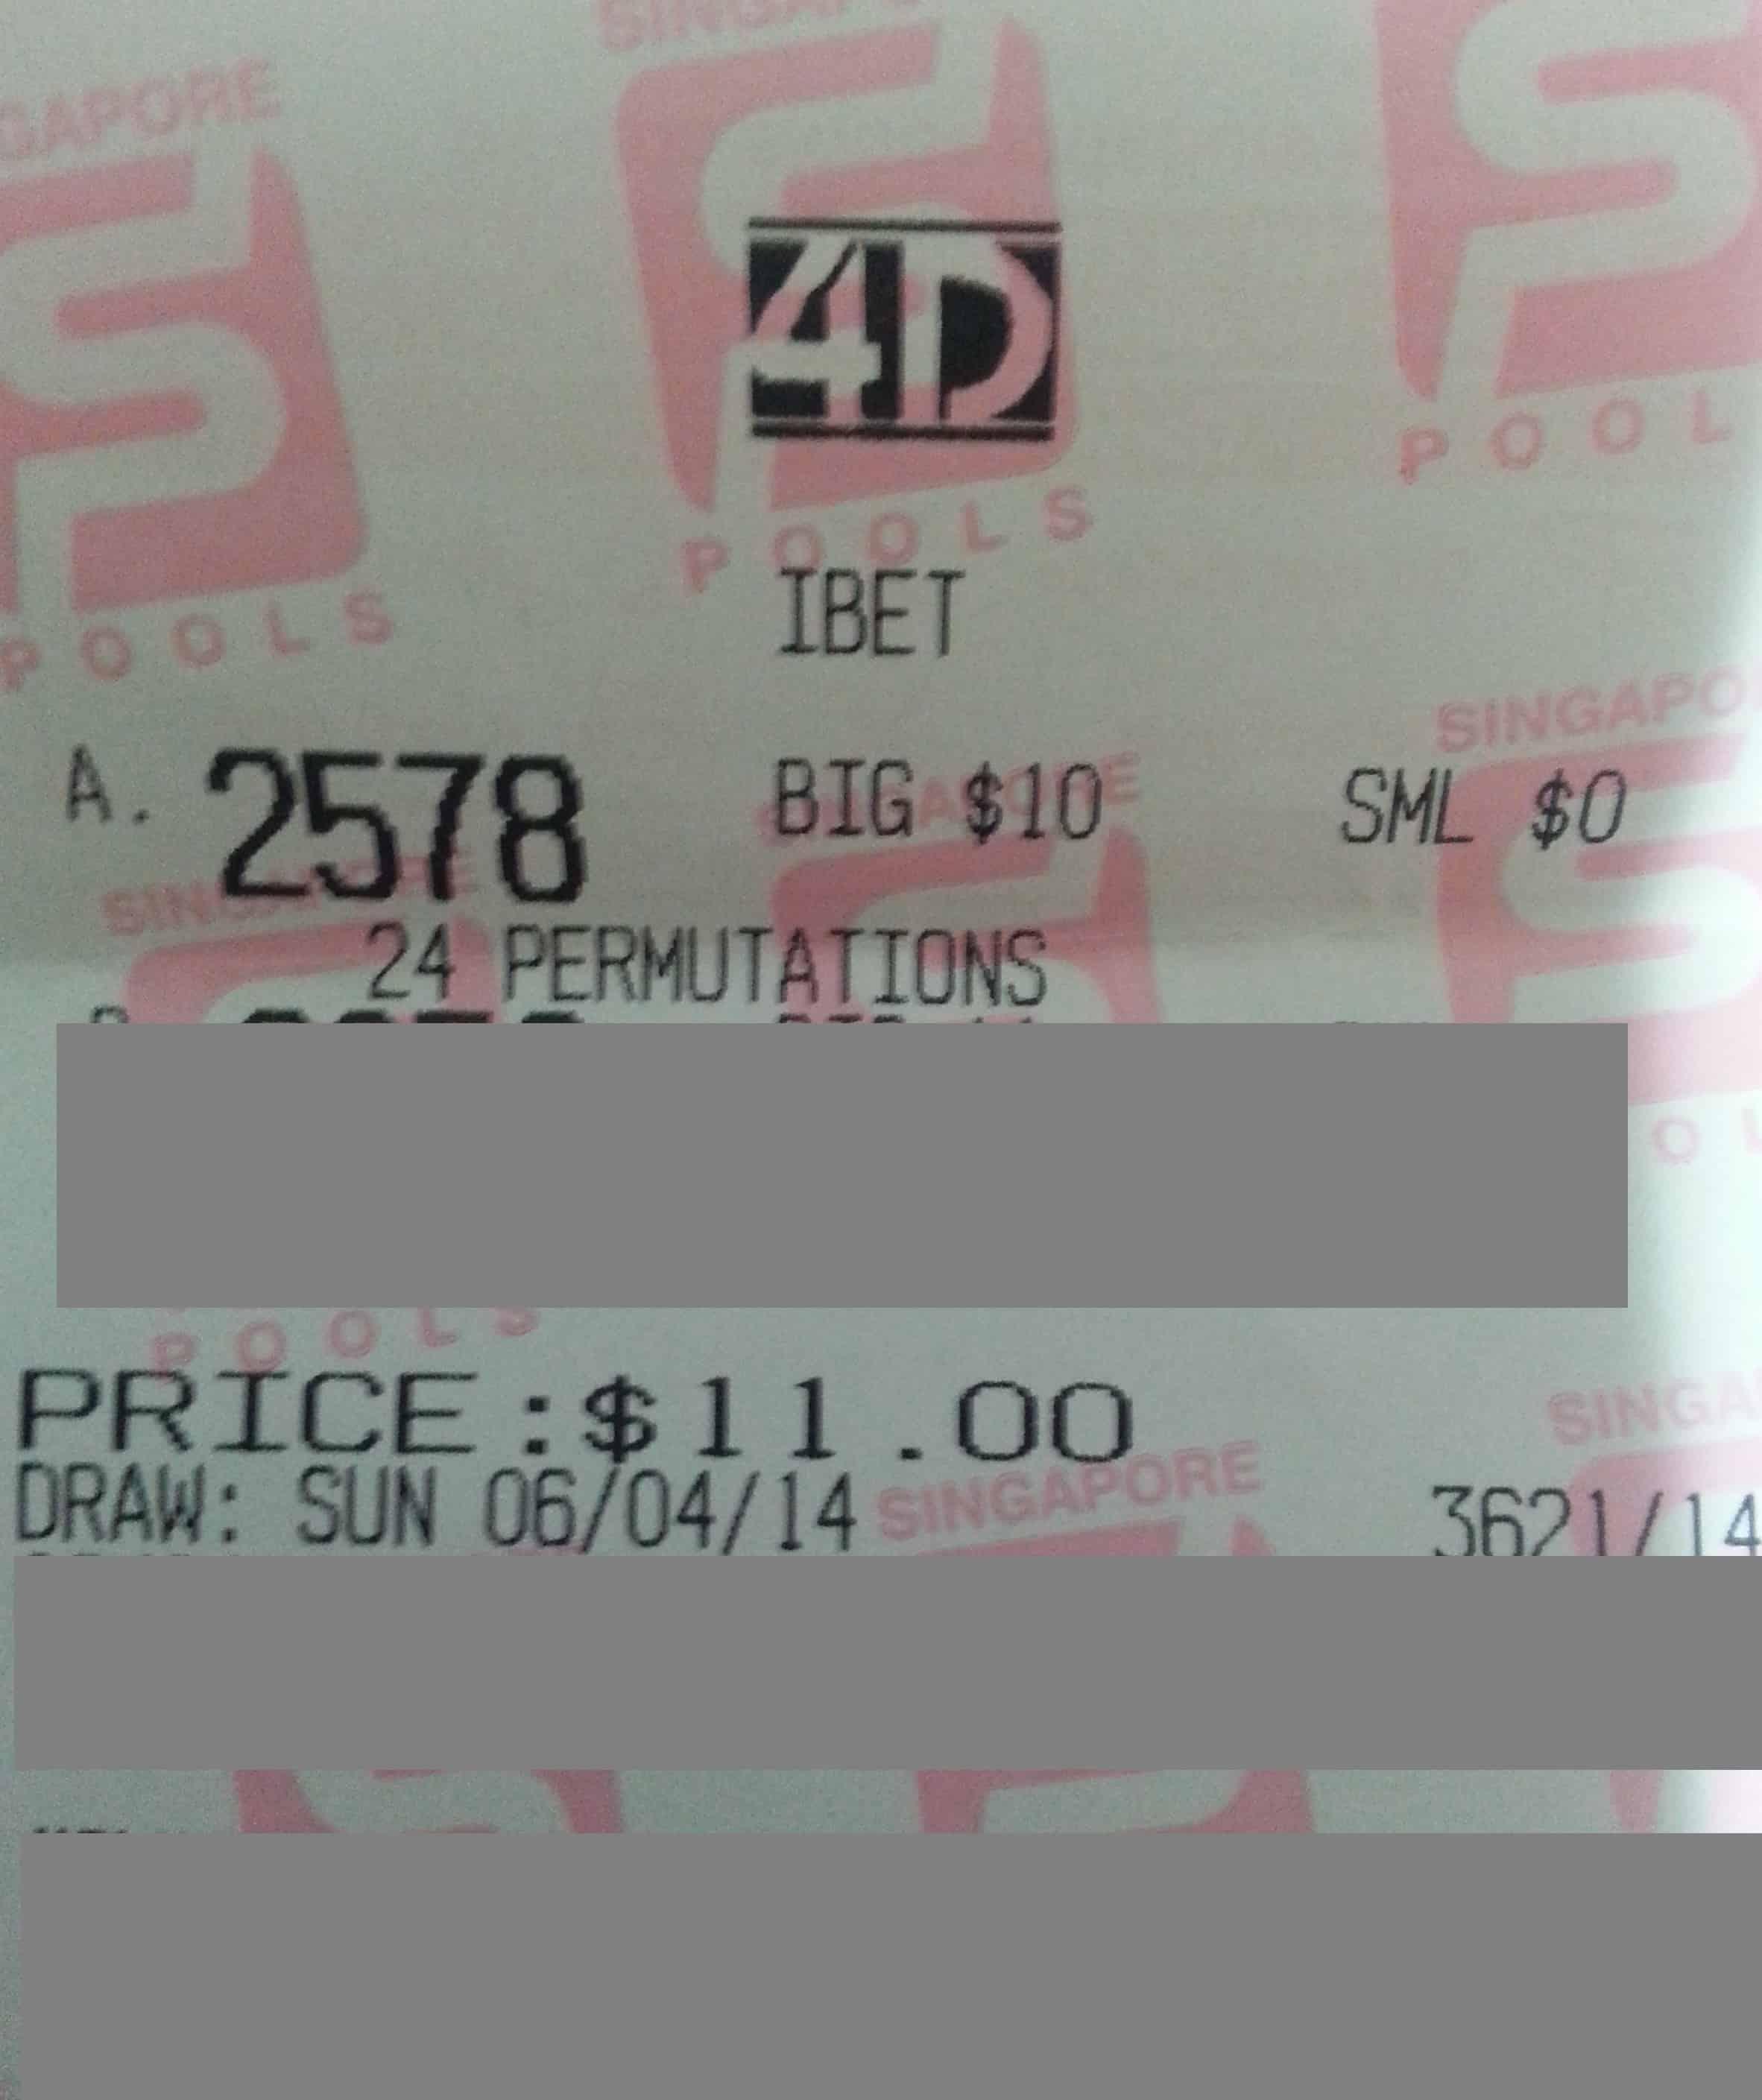 6 April $100 Winning Ticket | 4D SINGAPORE